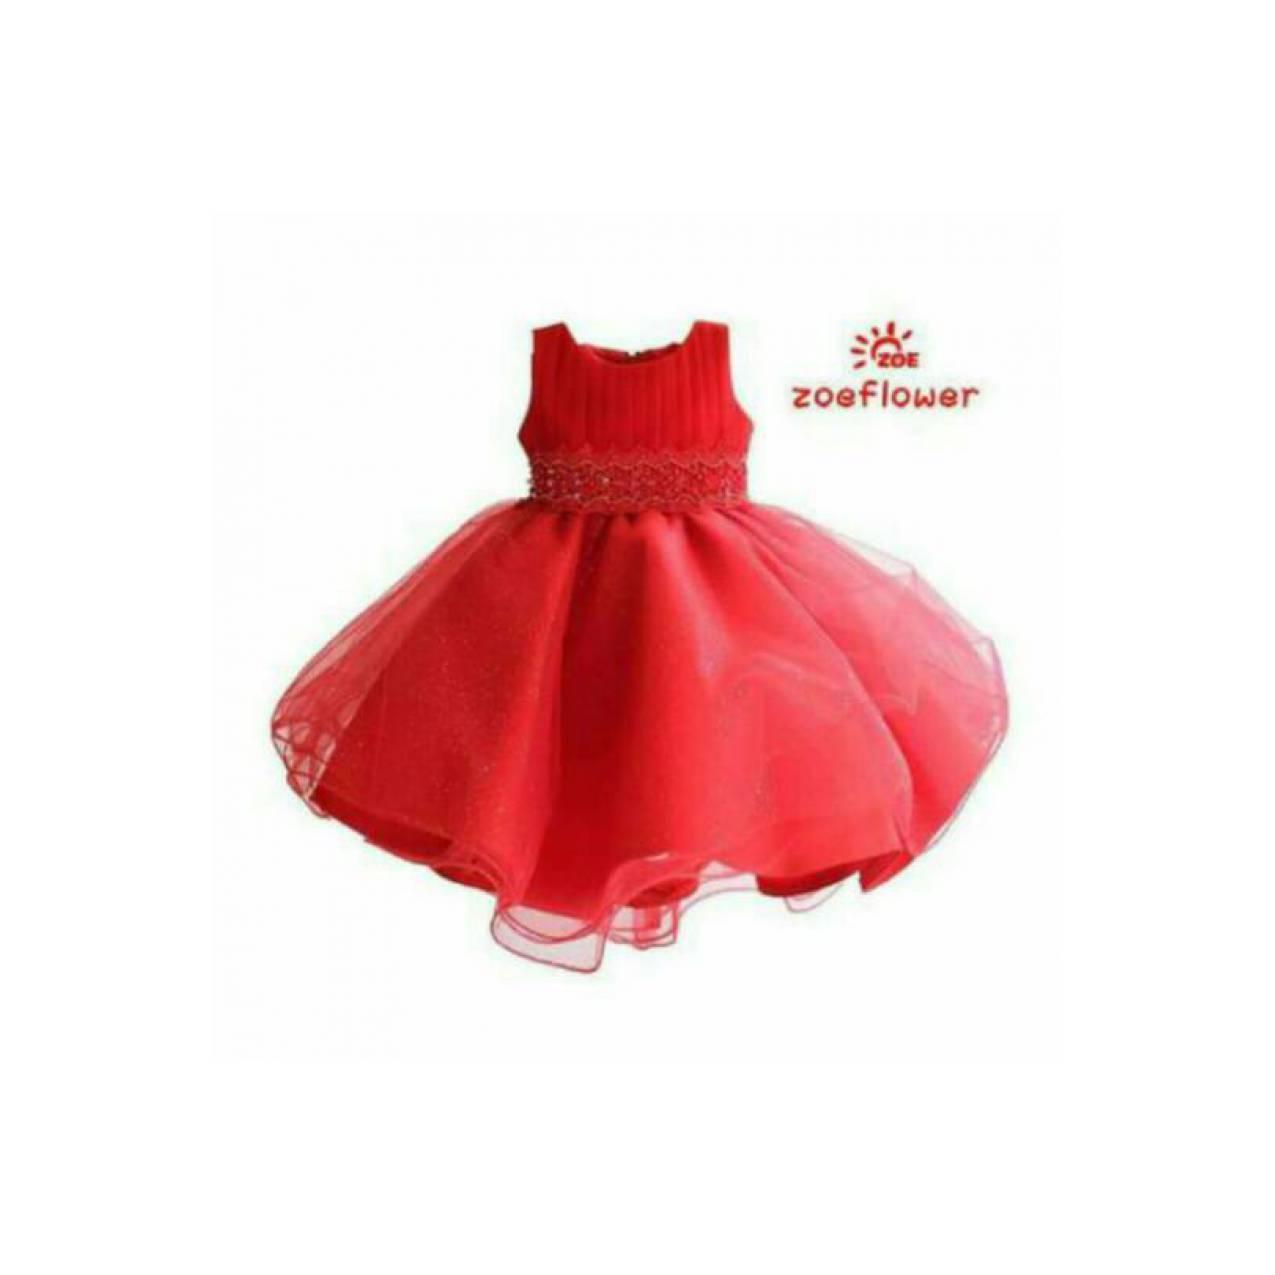 Summerfincor - JVN Dress Zoe Flower New Collection Premium Quality